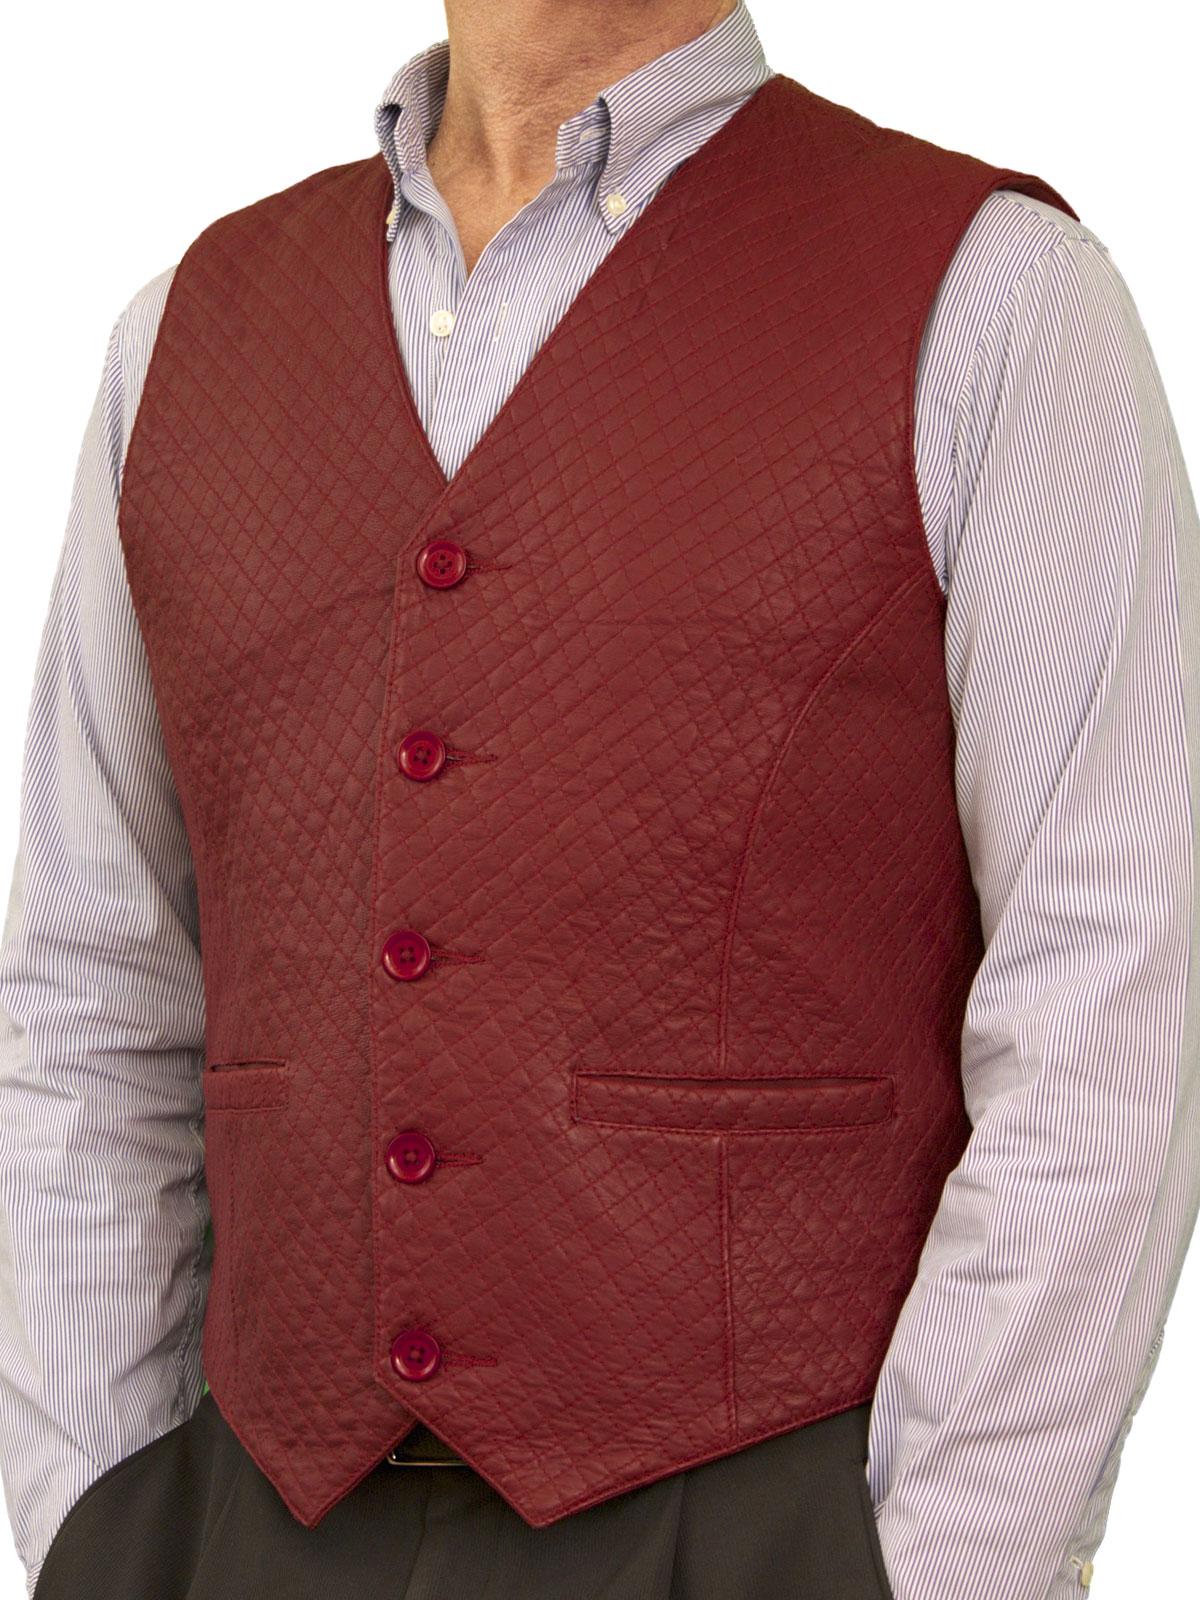 Mens Burgundy Diamond Stitch Leather Waistcoat